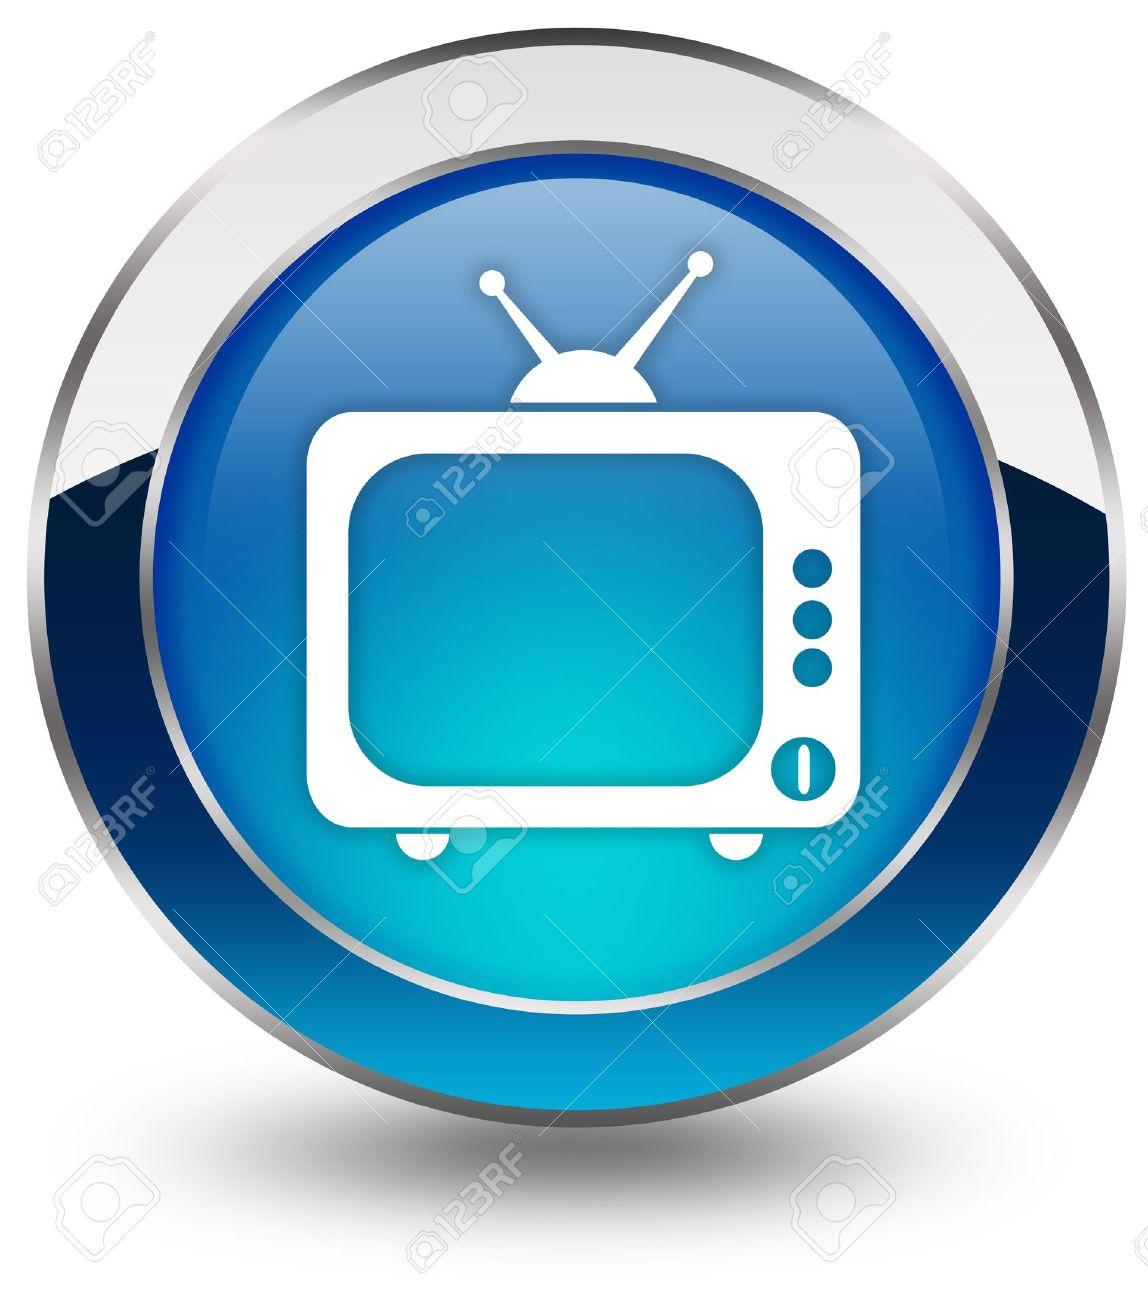 Tv icon Stock Photo - 9156469